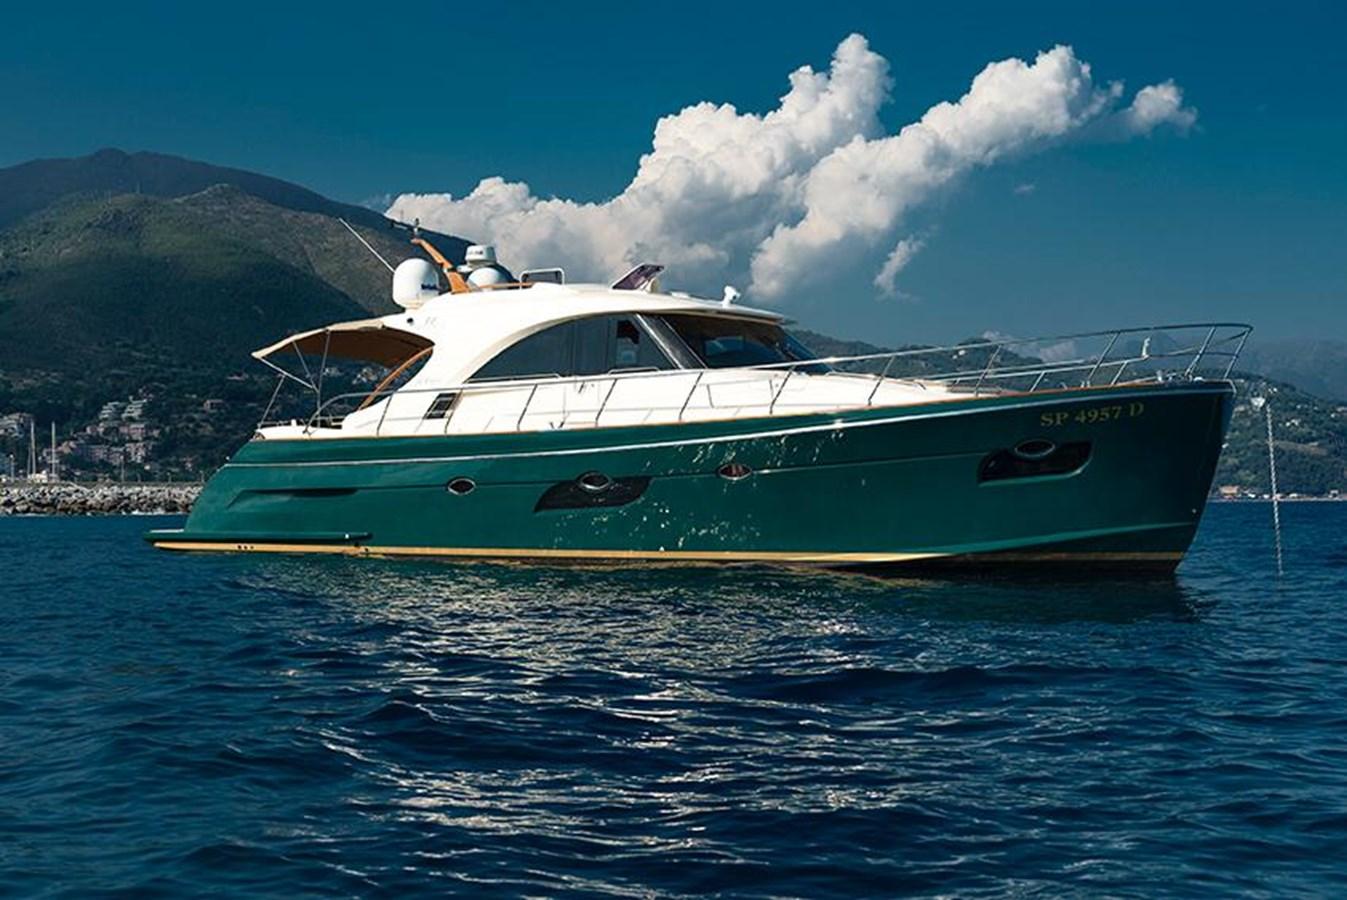 IMG-20200304-WA0022 2011 ABATI YACHTS kEYPORT 60 Motor Yacht 2879782